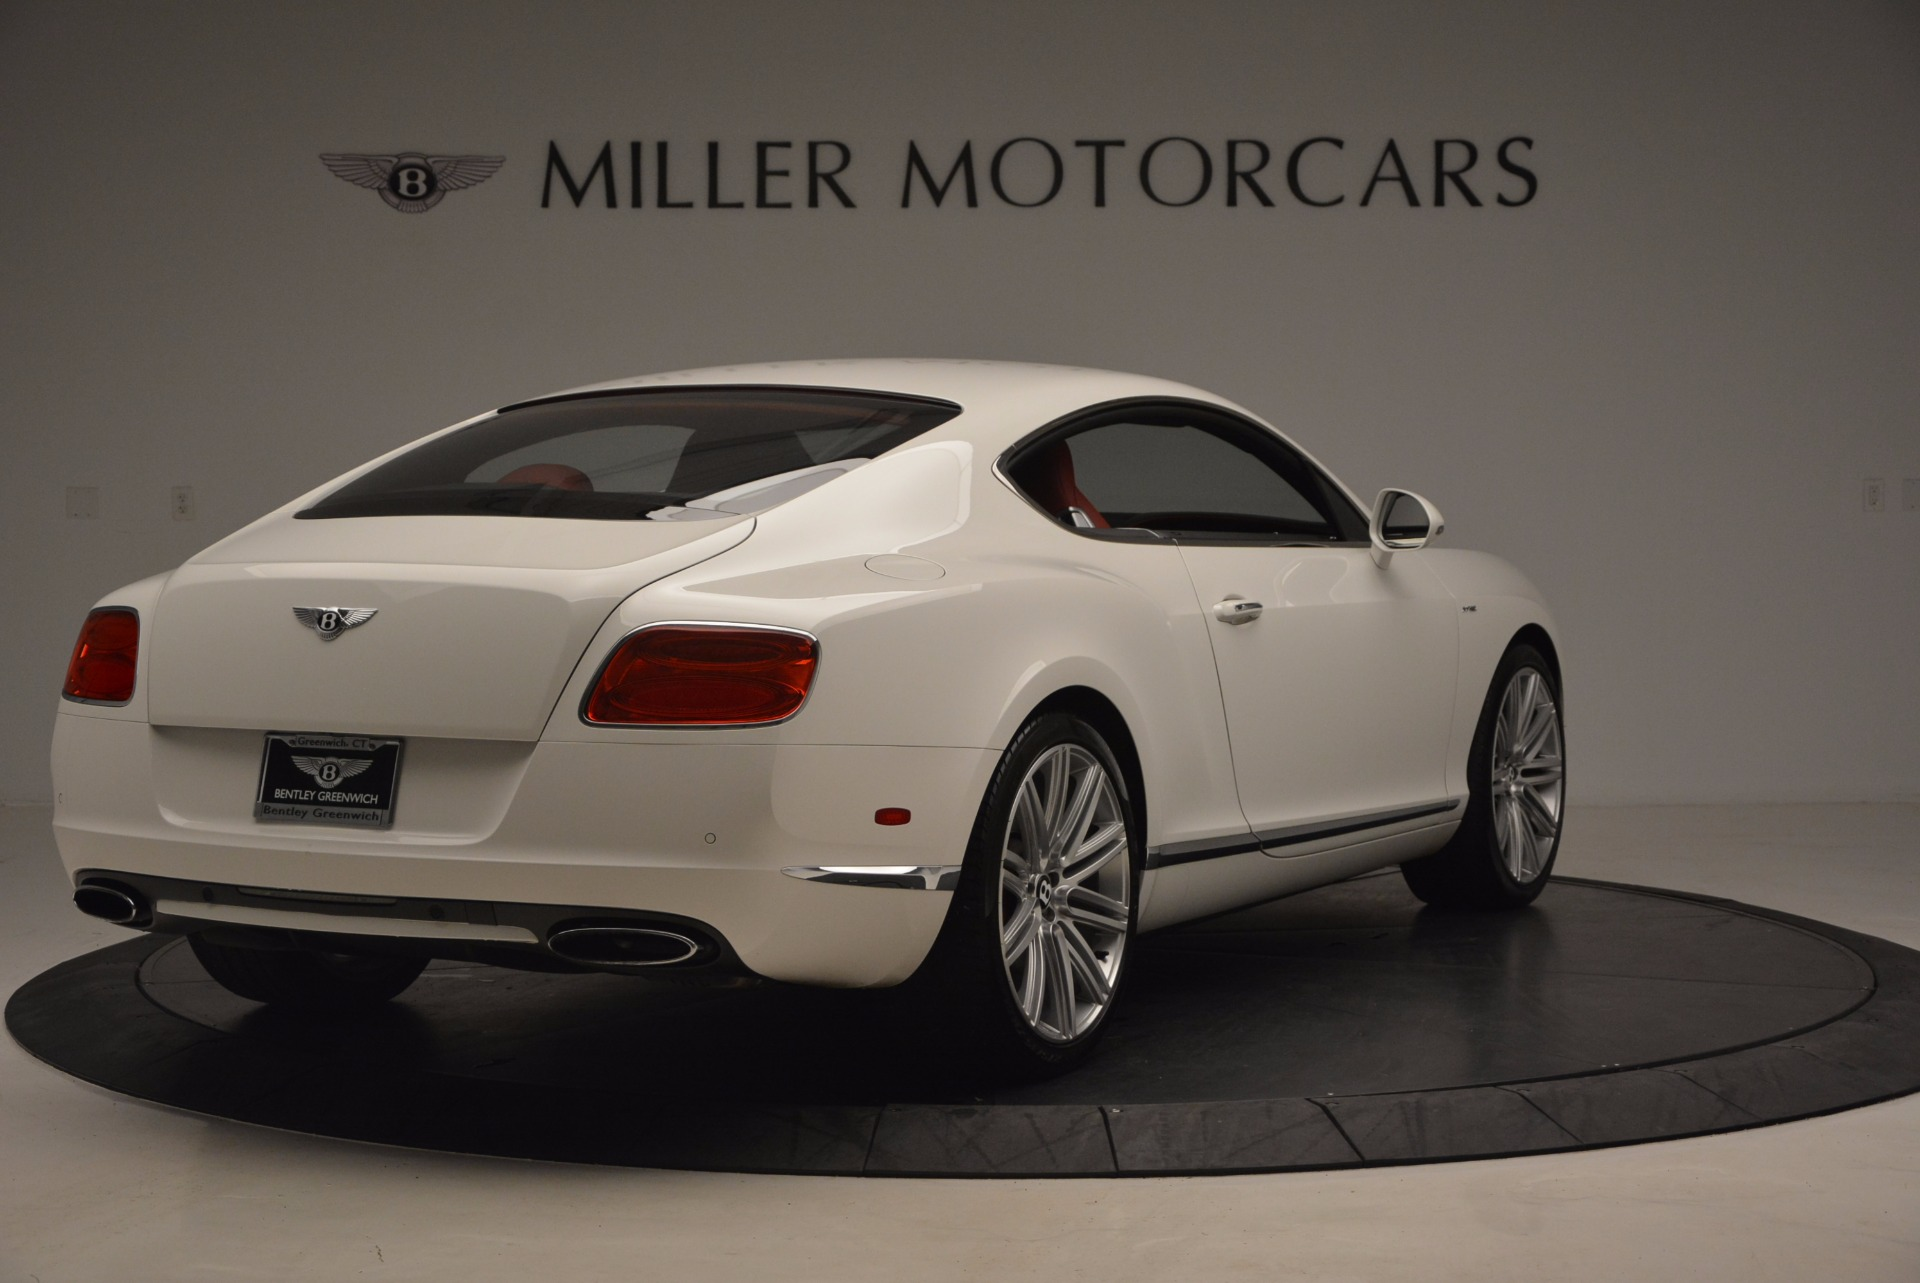 Used 2014 Bentley Continental GT Speed For Sale In Westport, CT 1102_p8